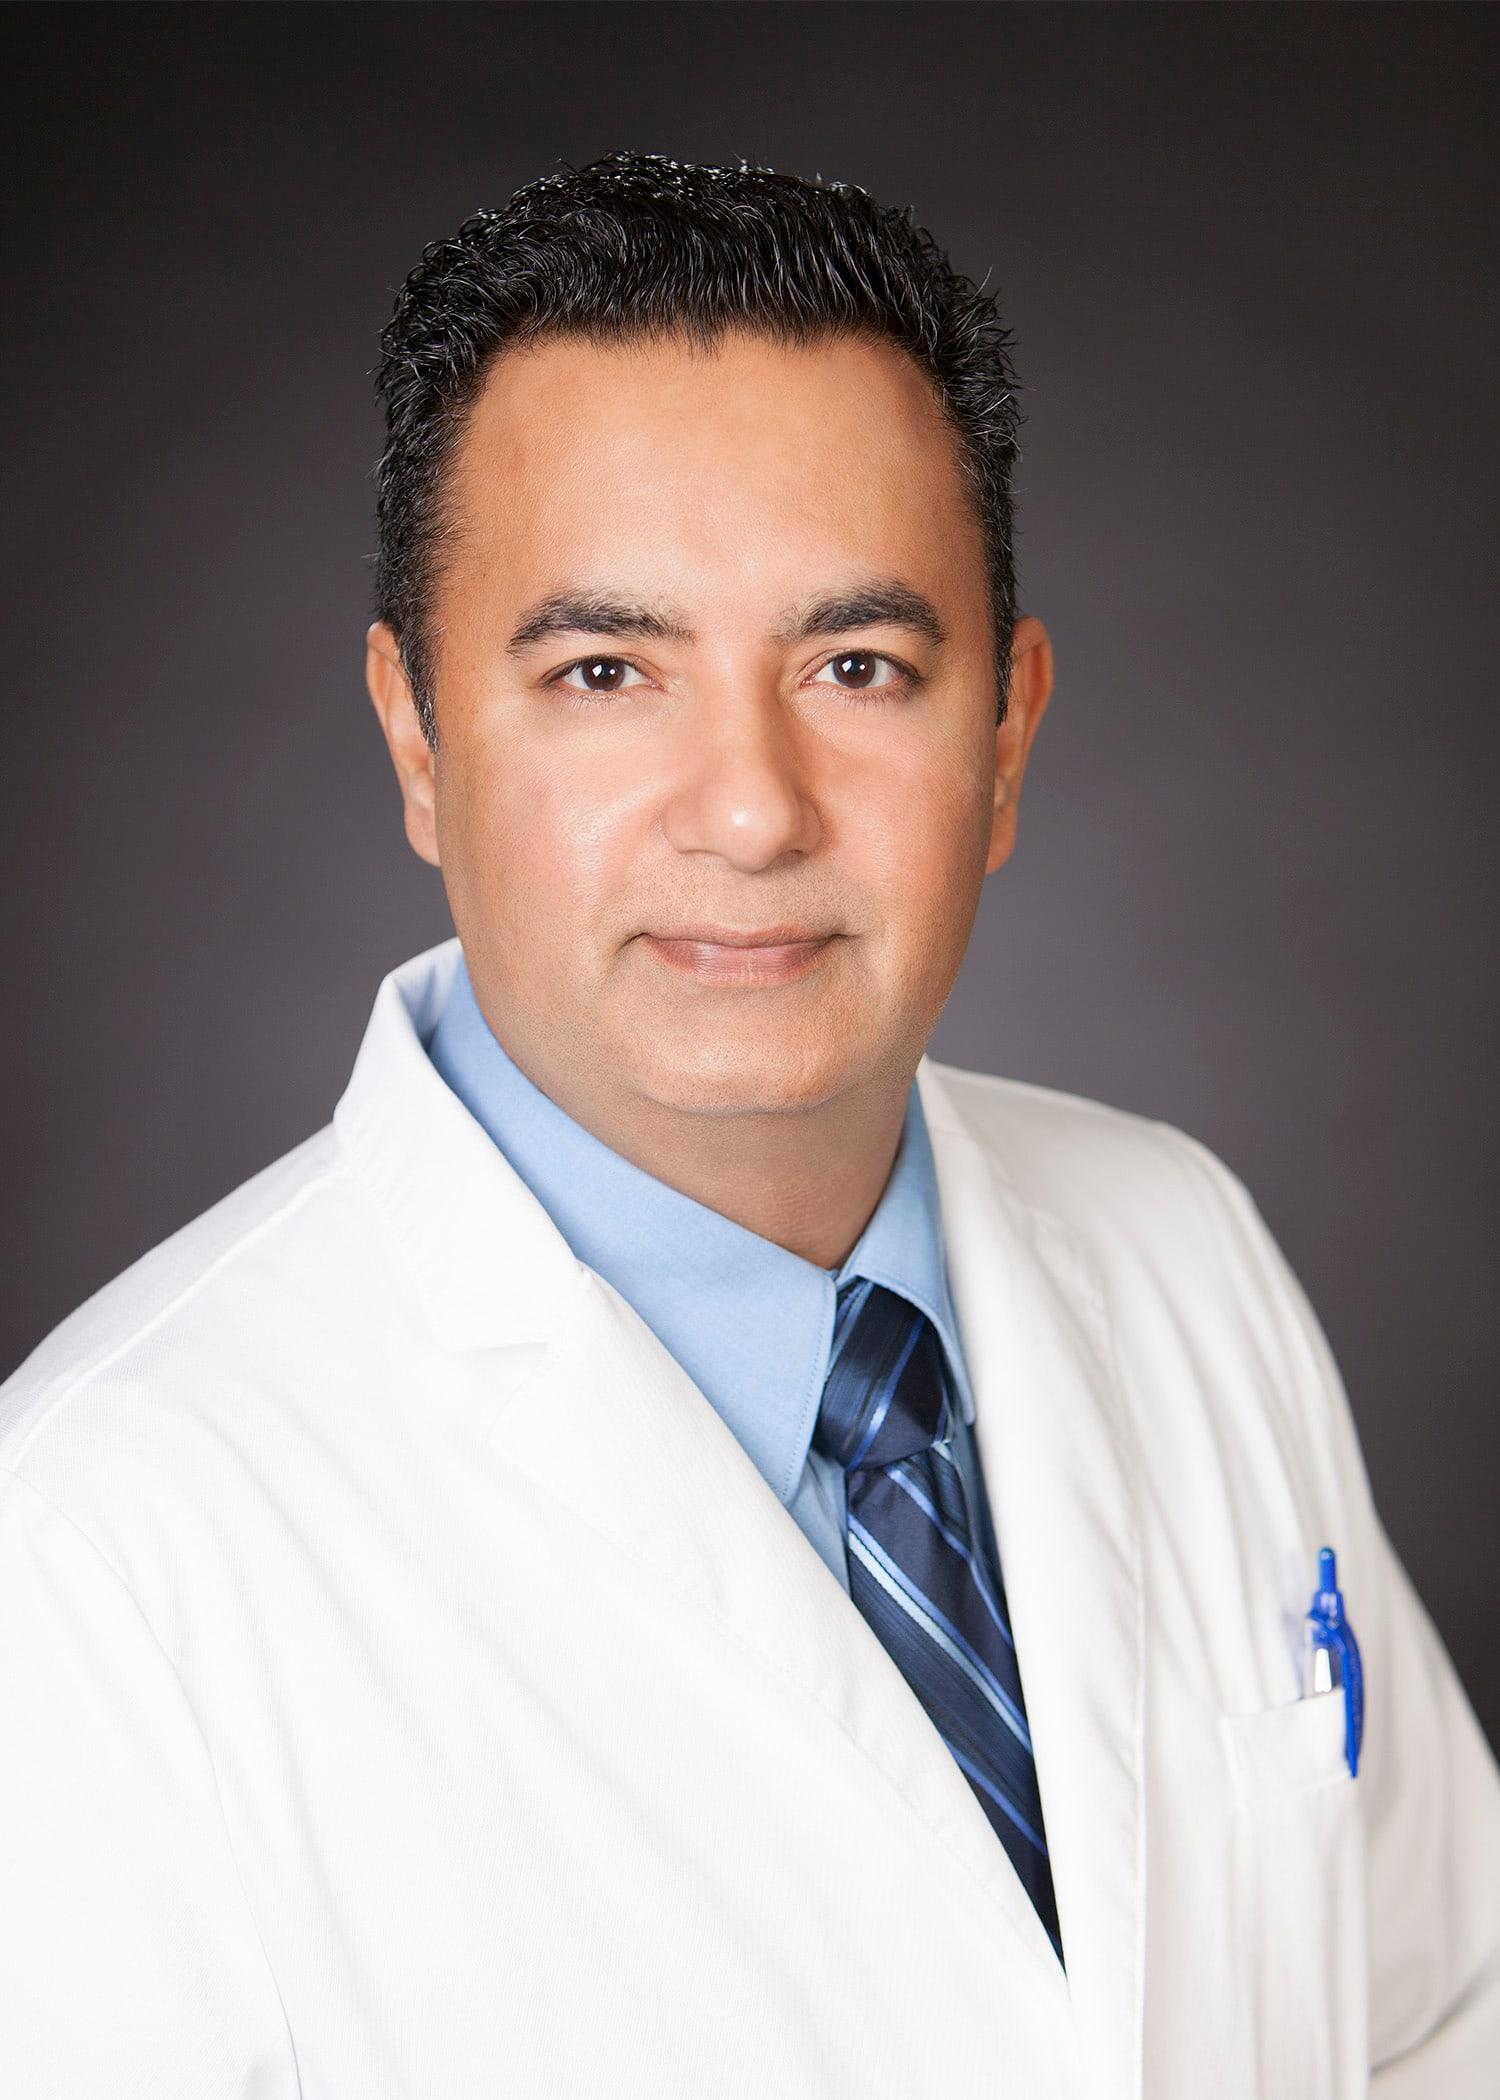 Manmeet S Padda, MD Gastroenterology